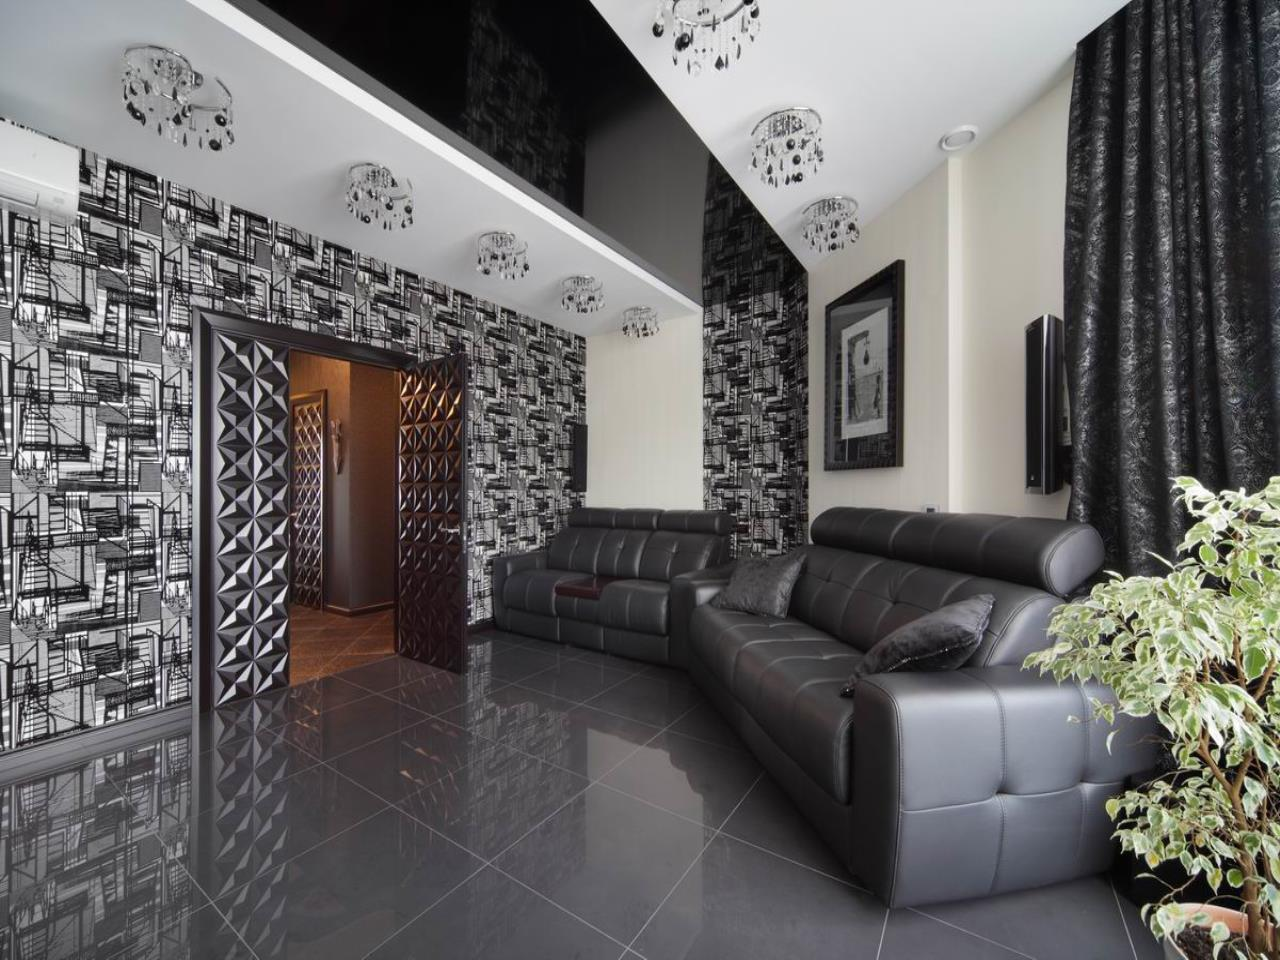 Monochrome hall decor